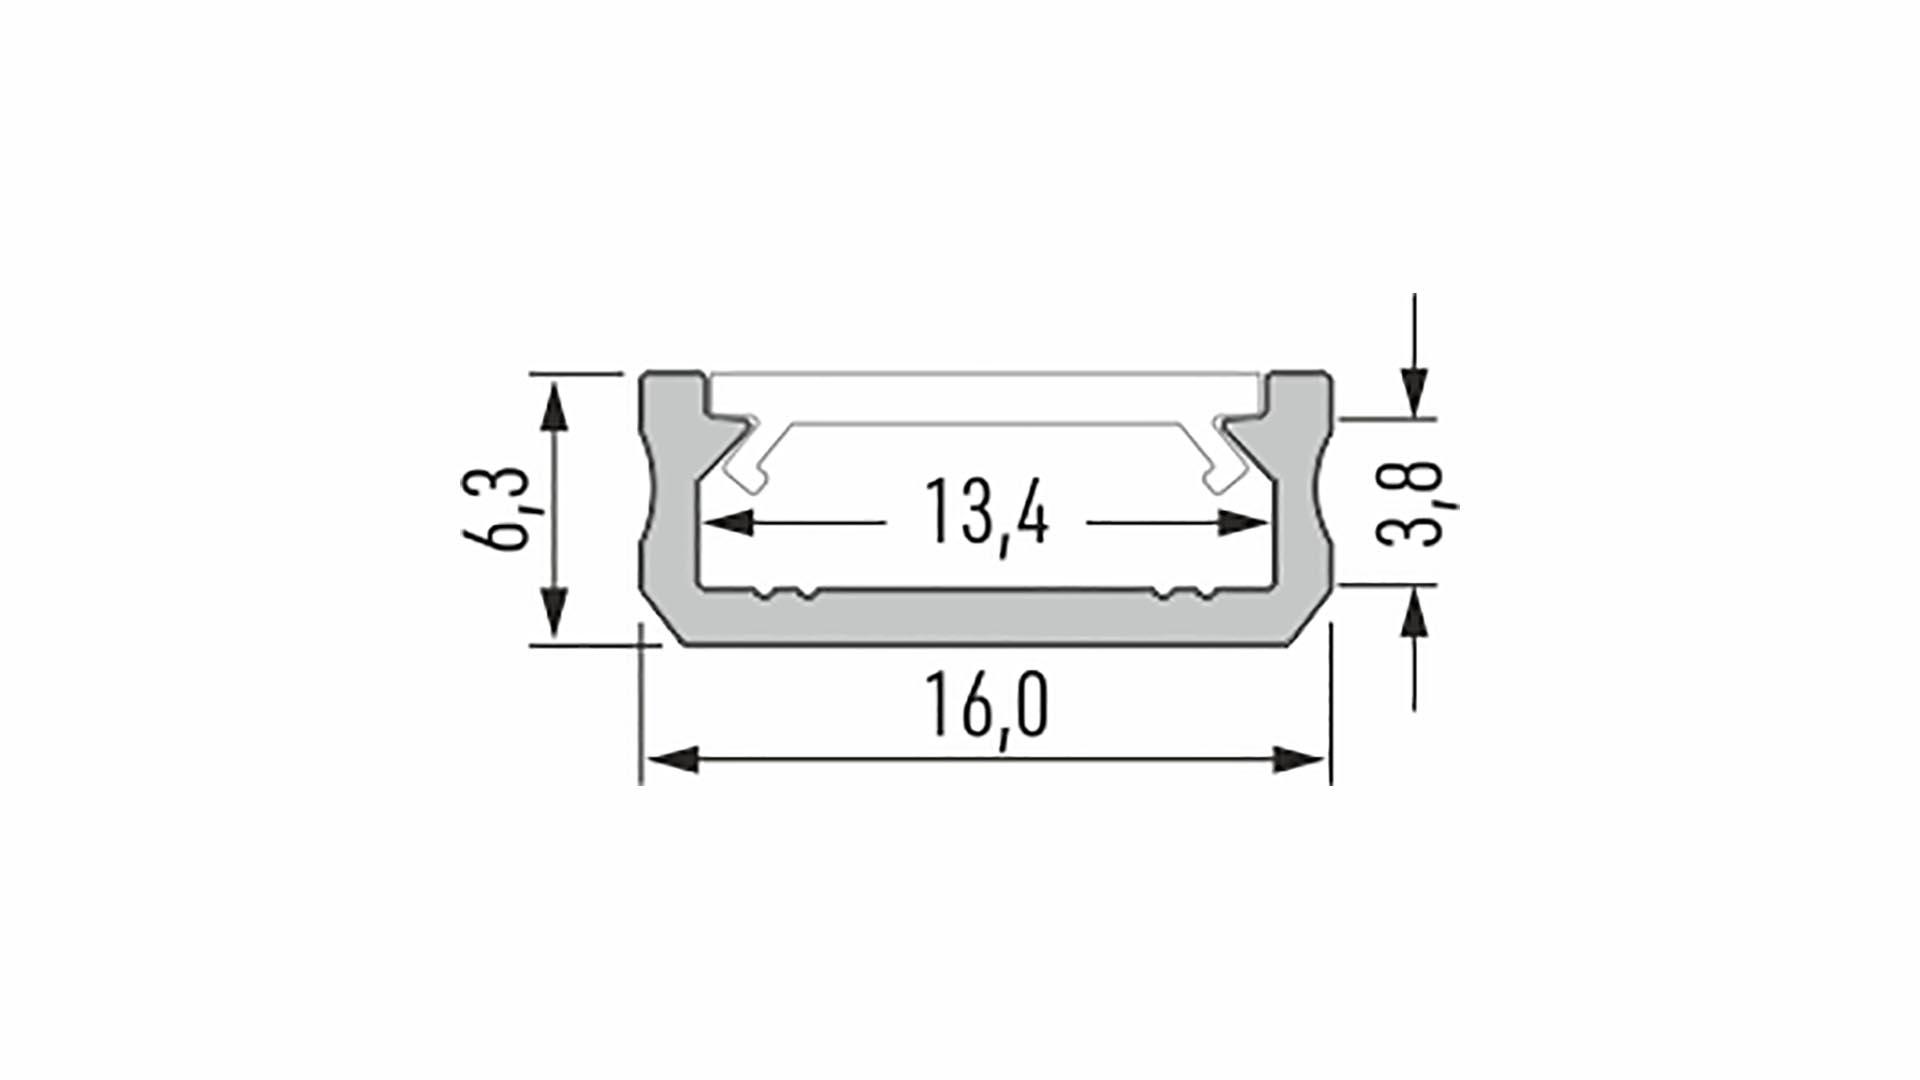 Lumines profile type D nonanodized, 3 m